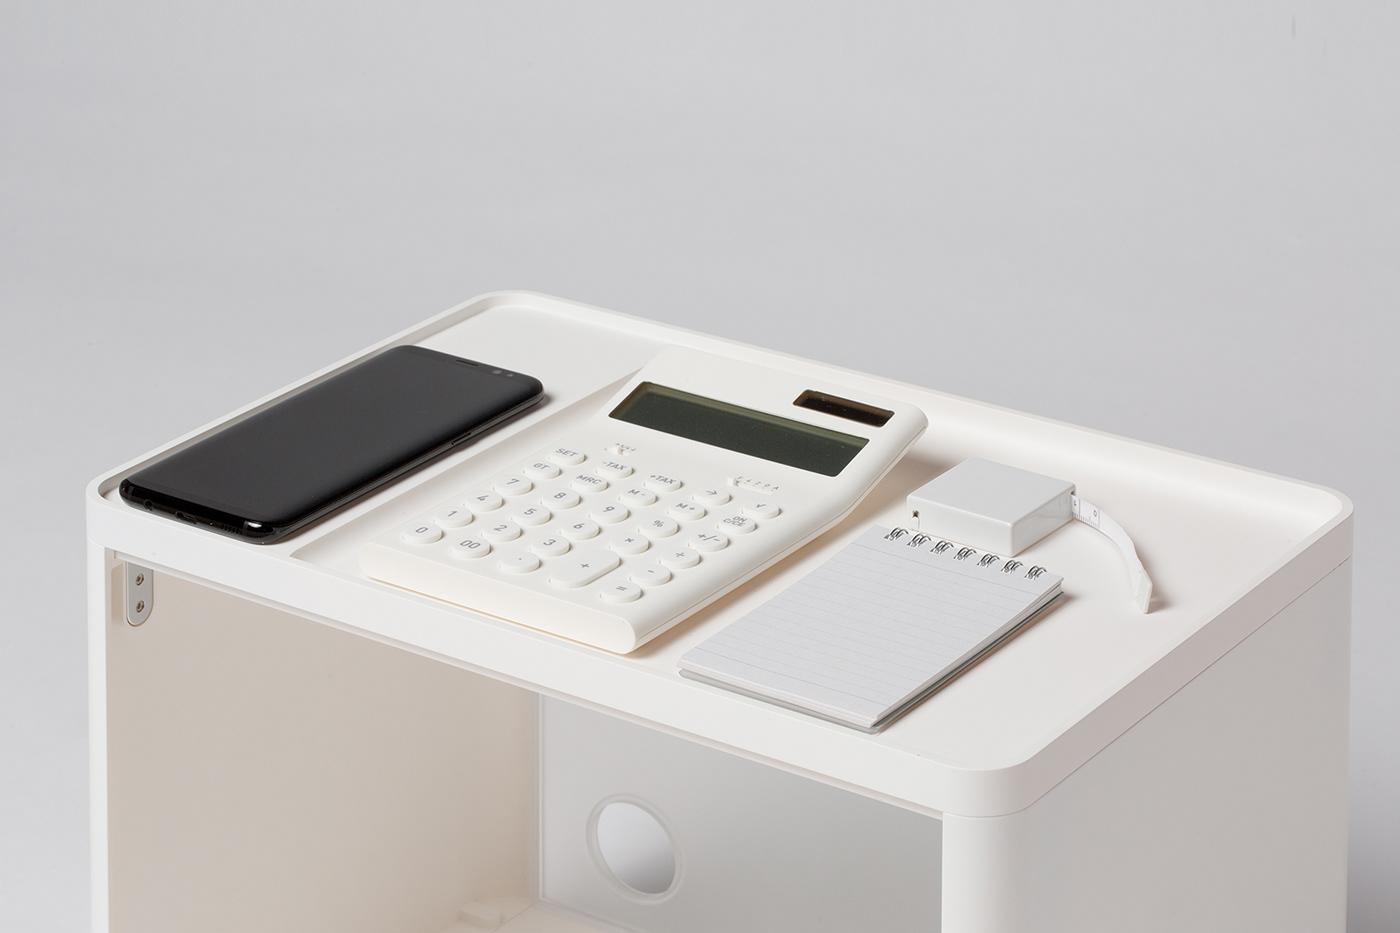 Image may contain: computer, computer keyboard and indoor